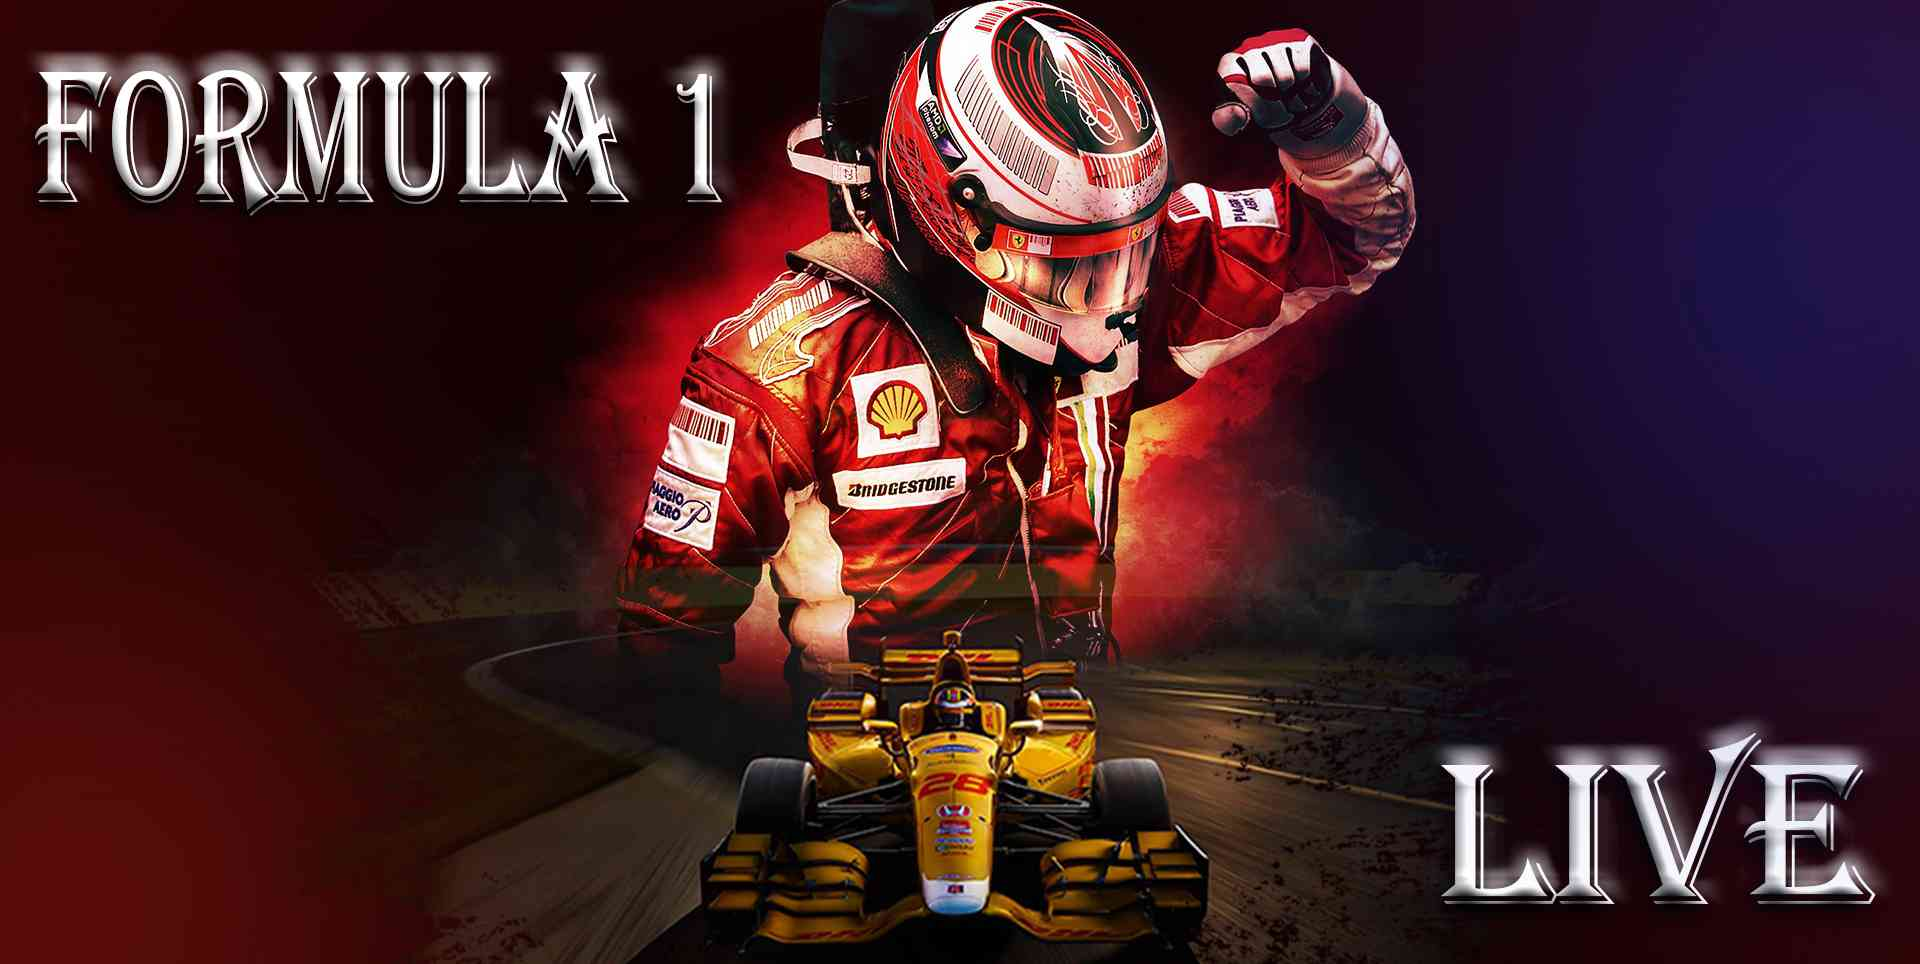 Live Telecast Monaco Grand Prix